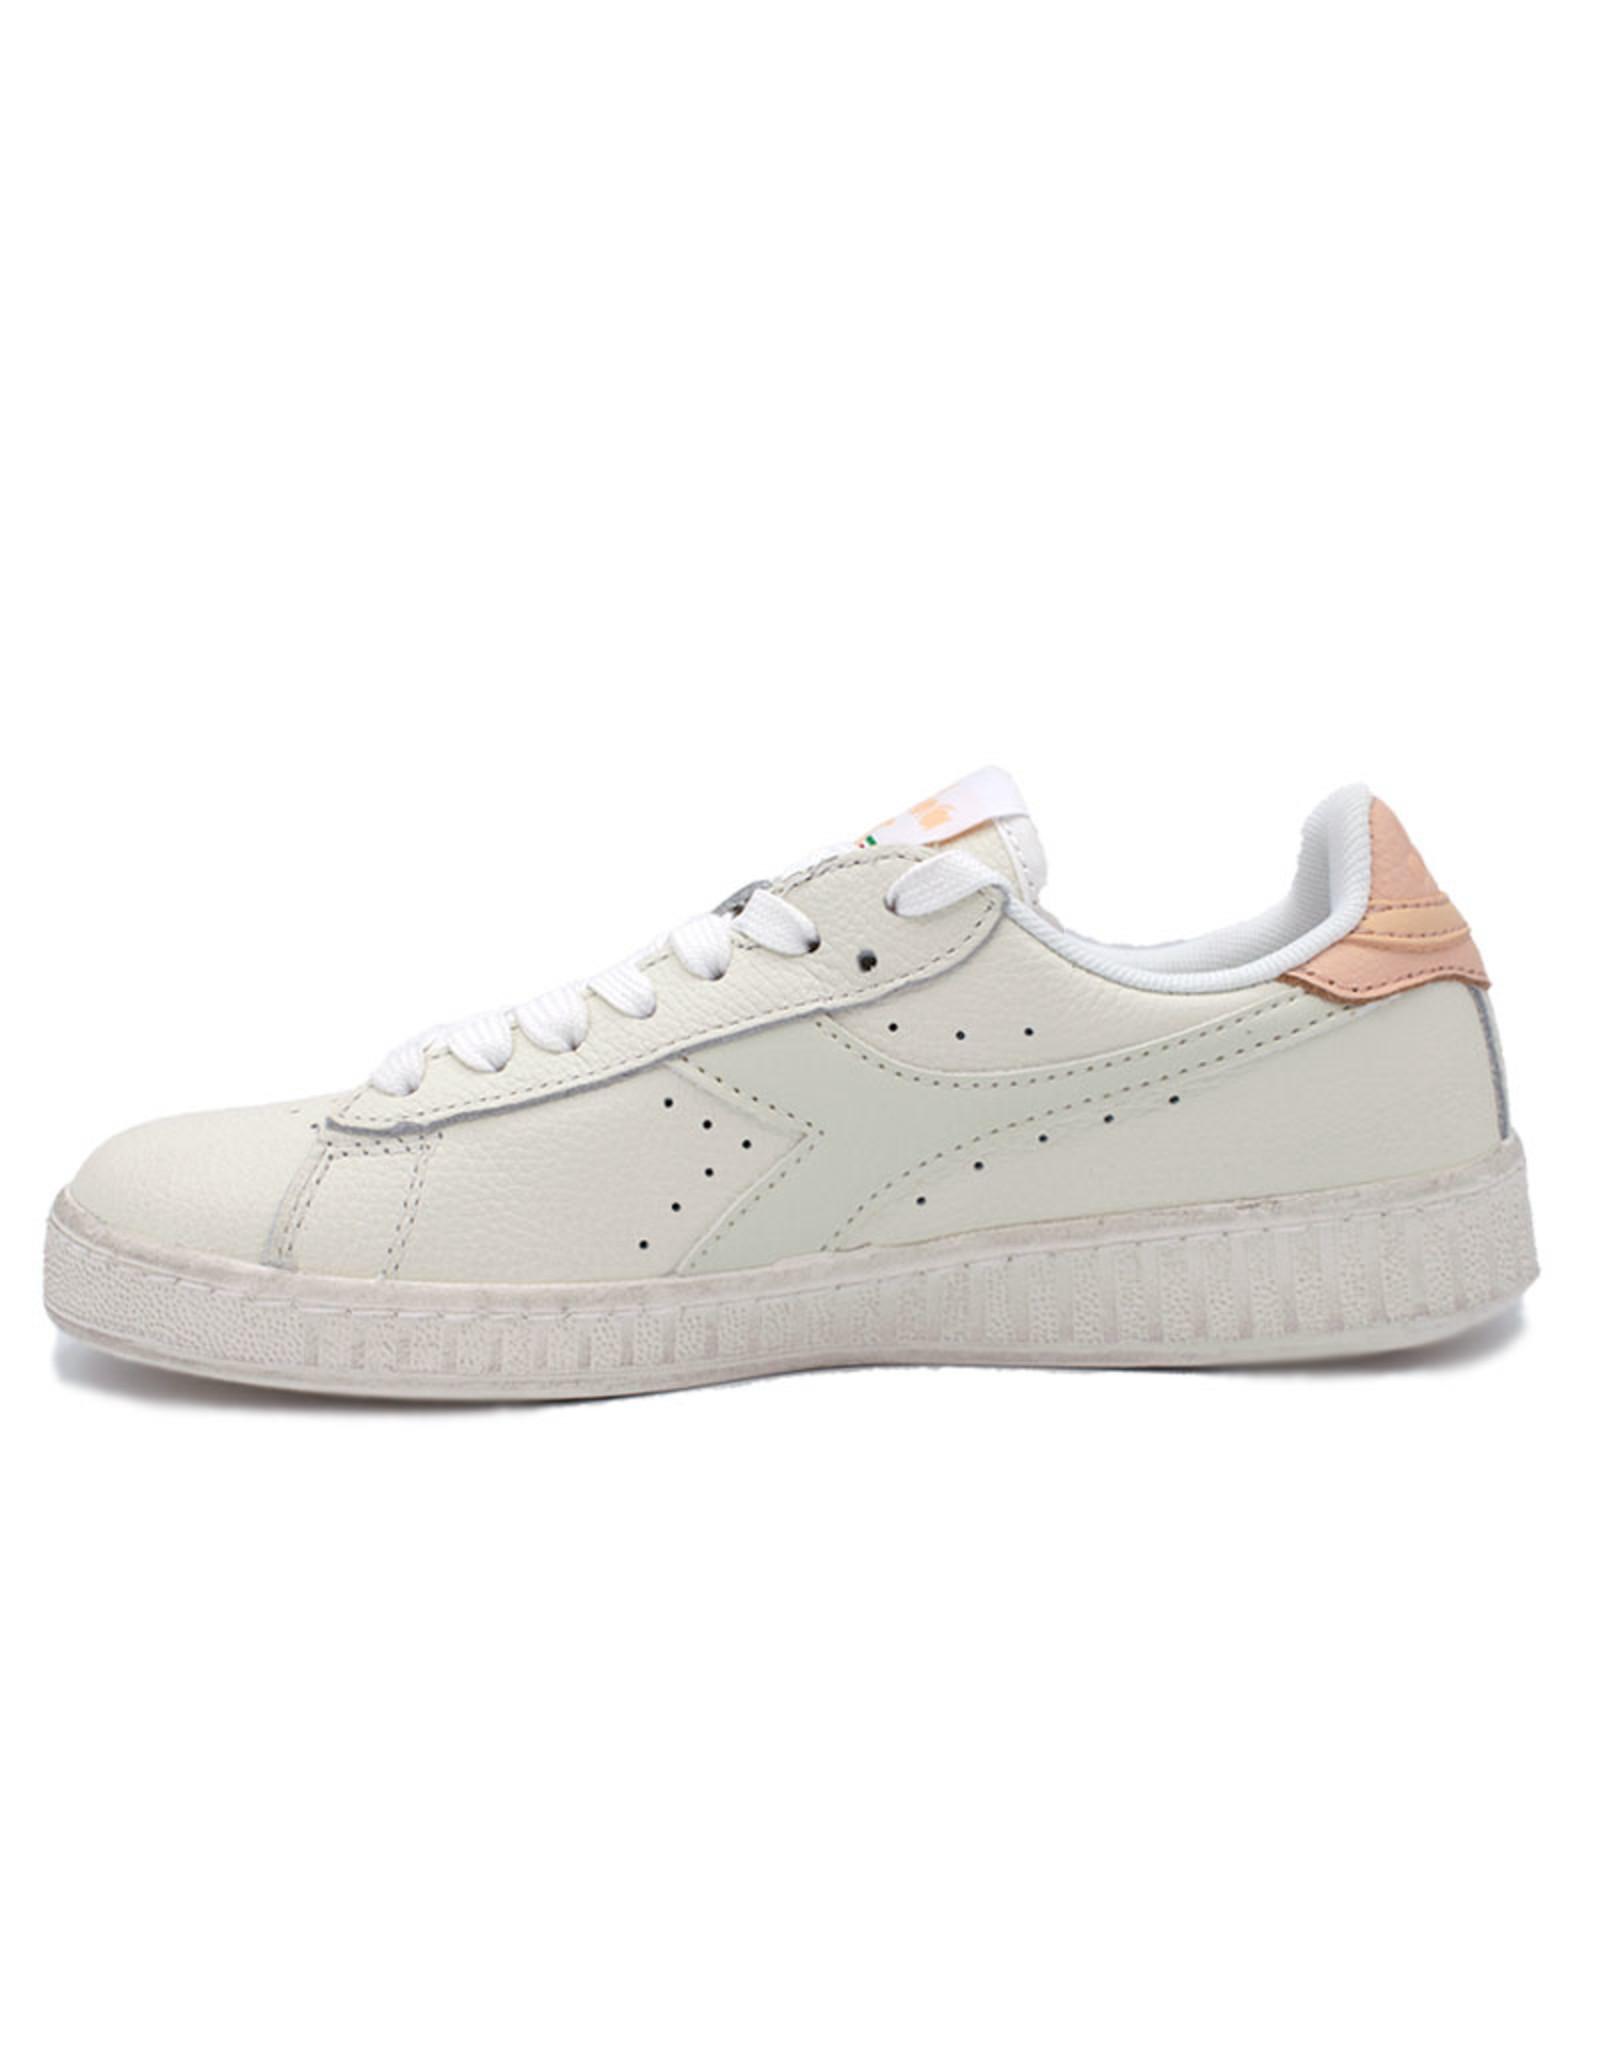 DIADORA DIADORA white pale peach